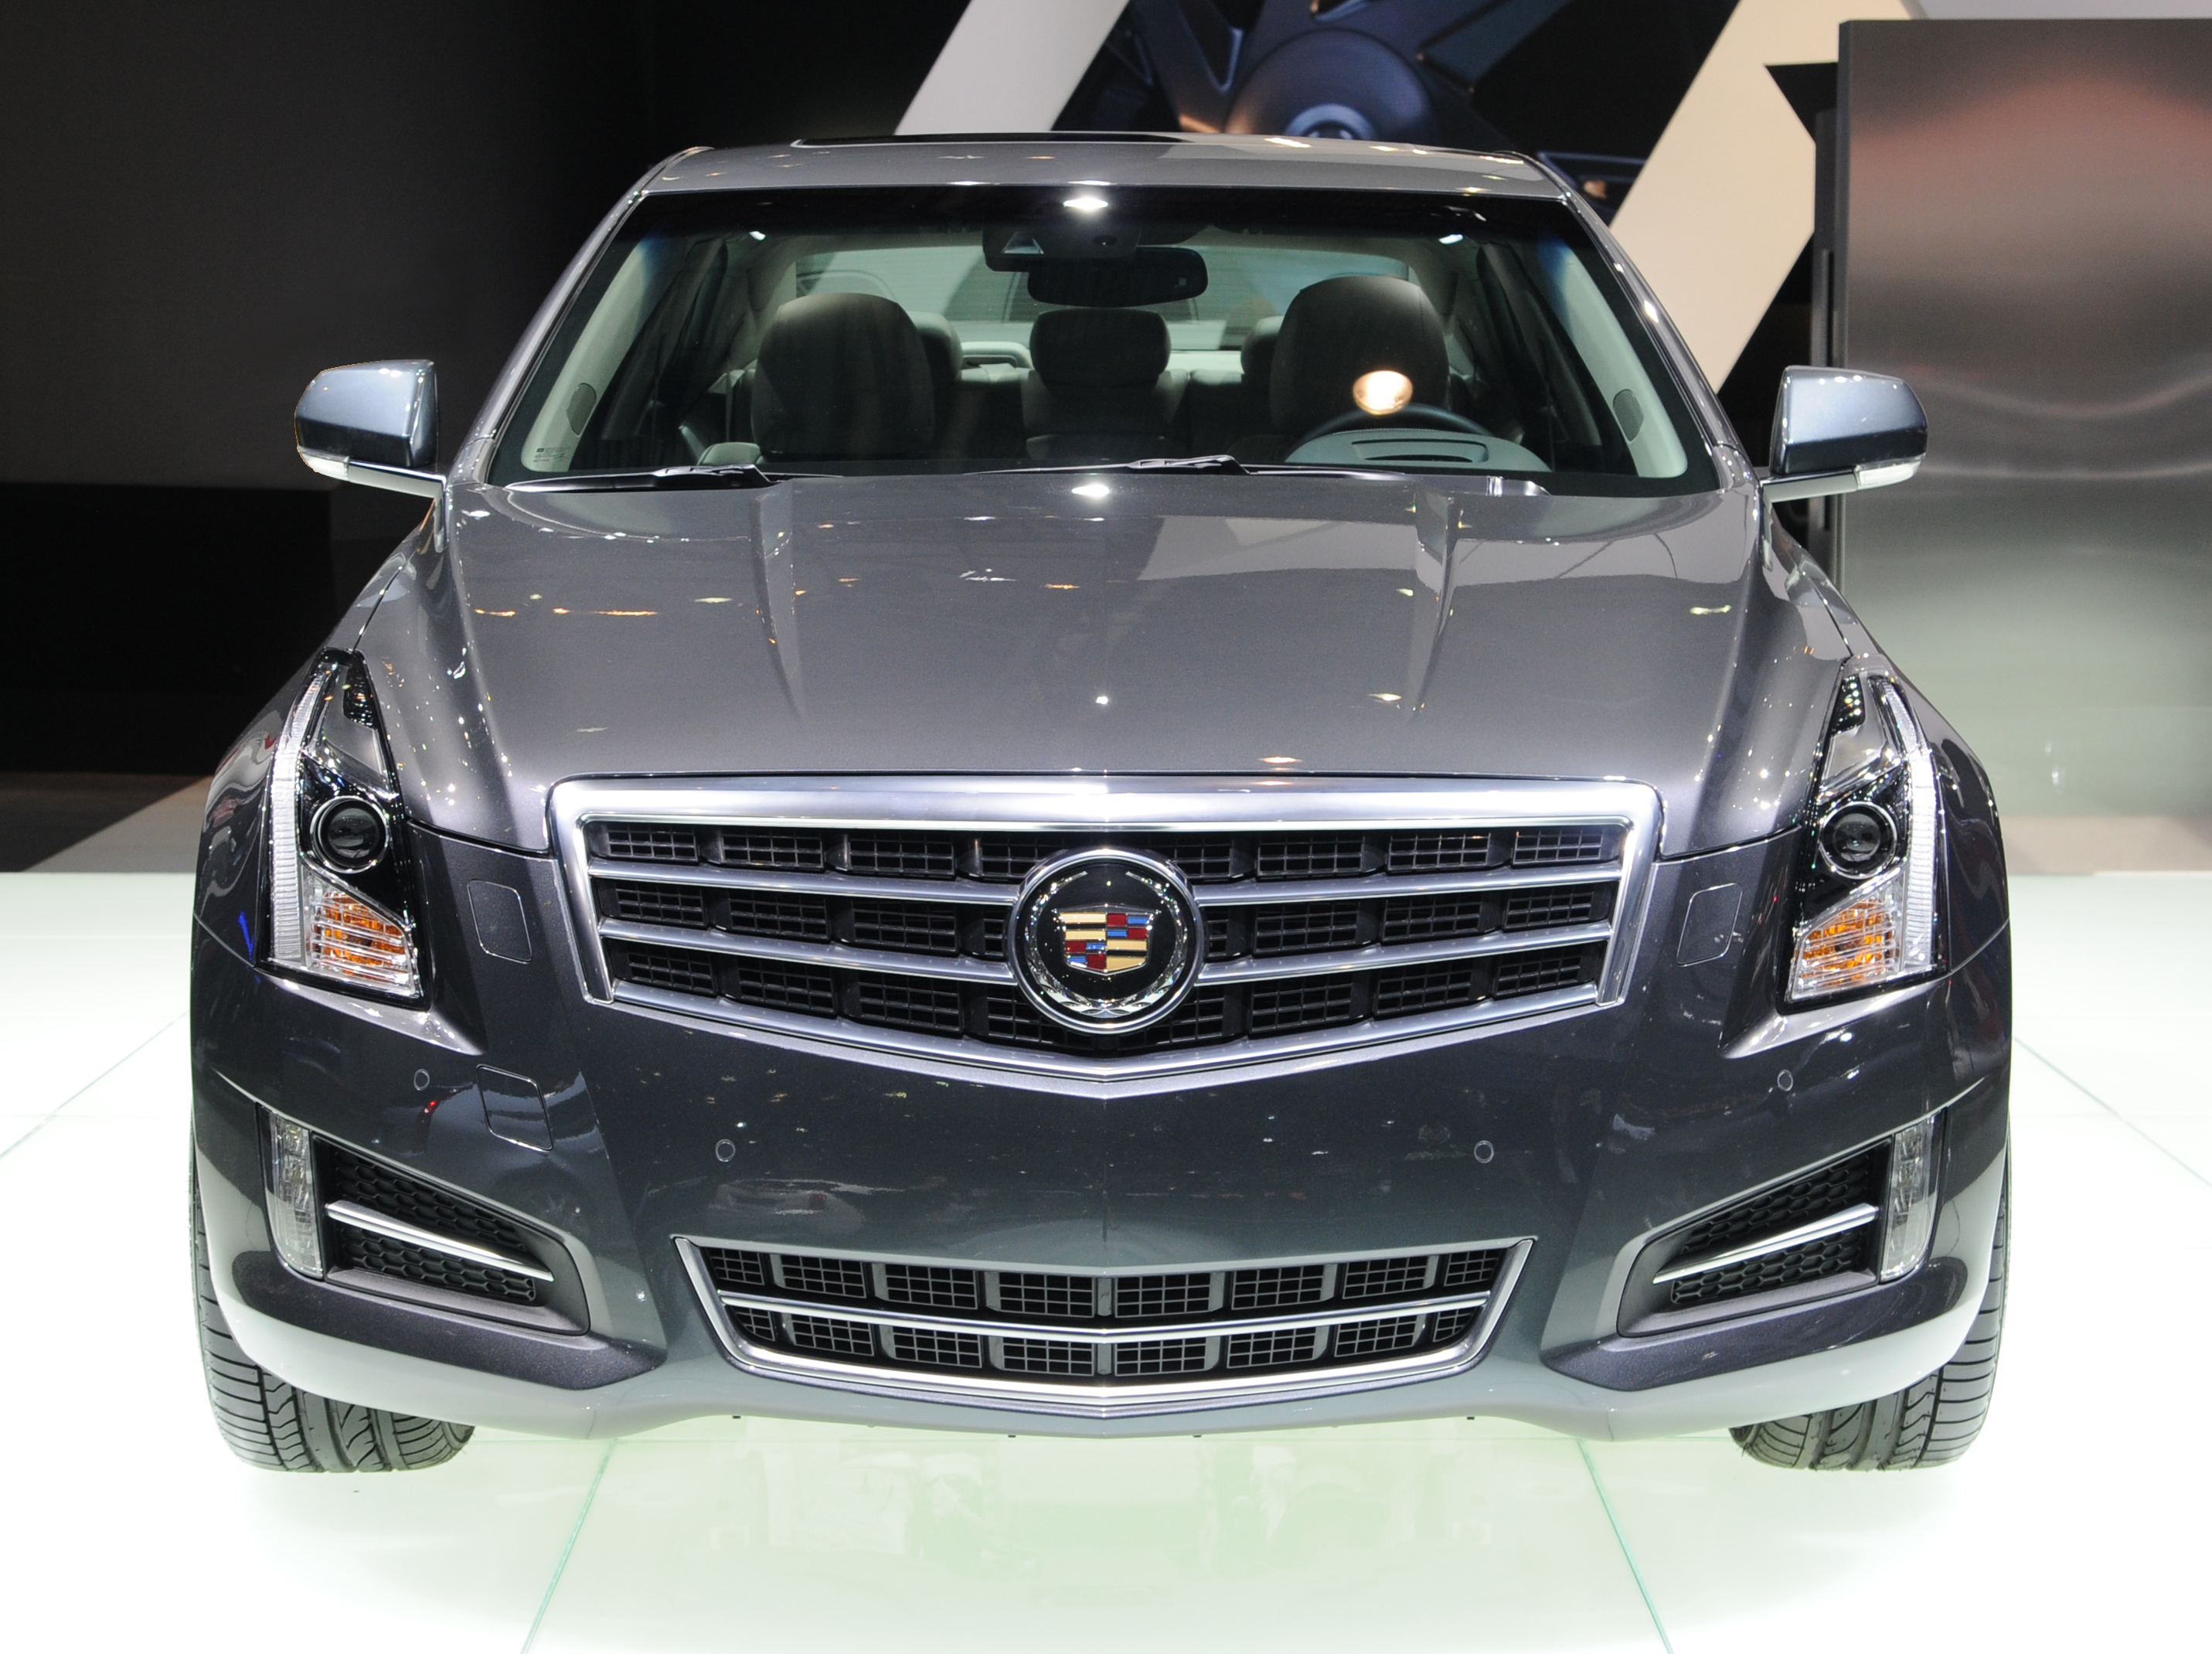 File:Cadillac ATS 2013 03 05 Geneva Motor Show